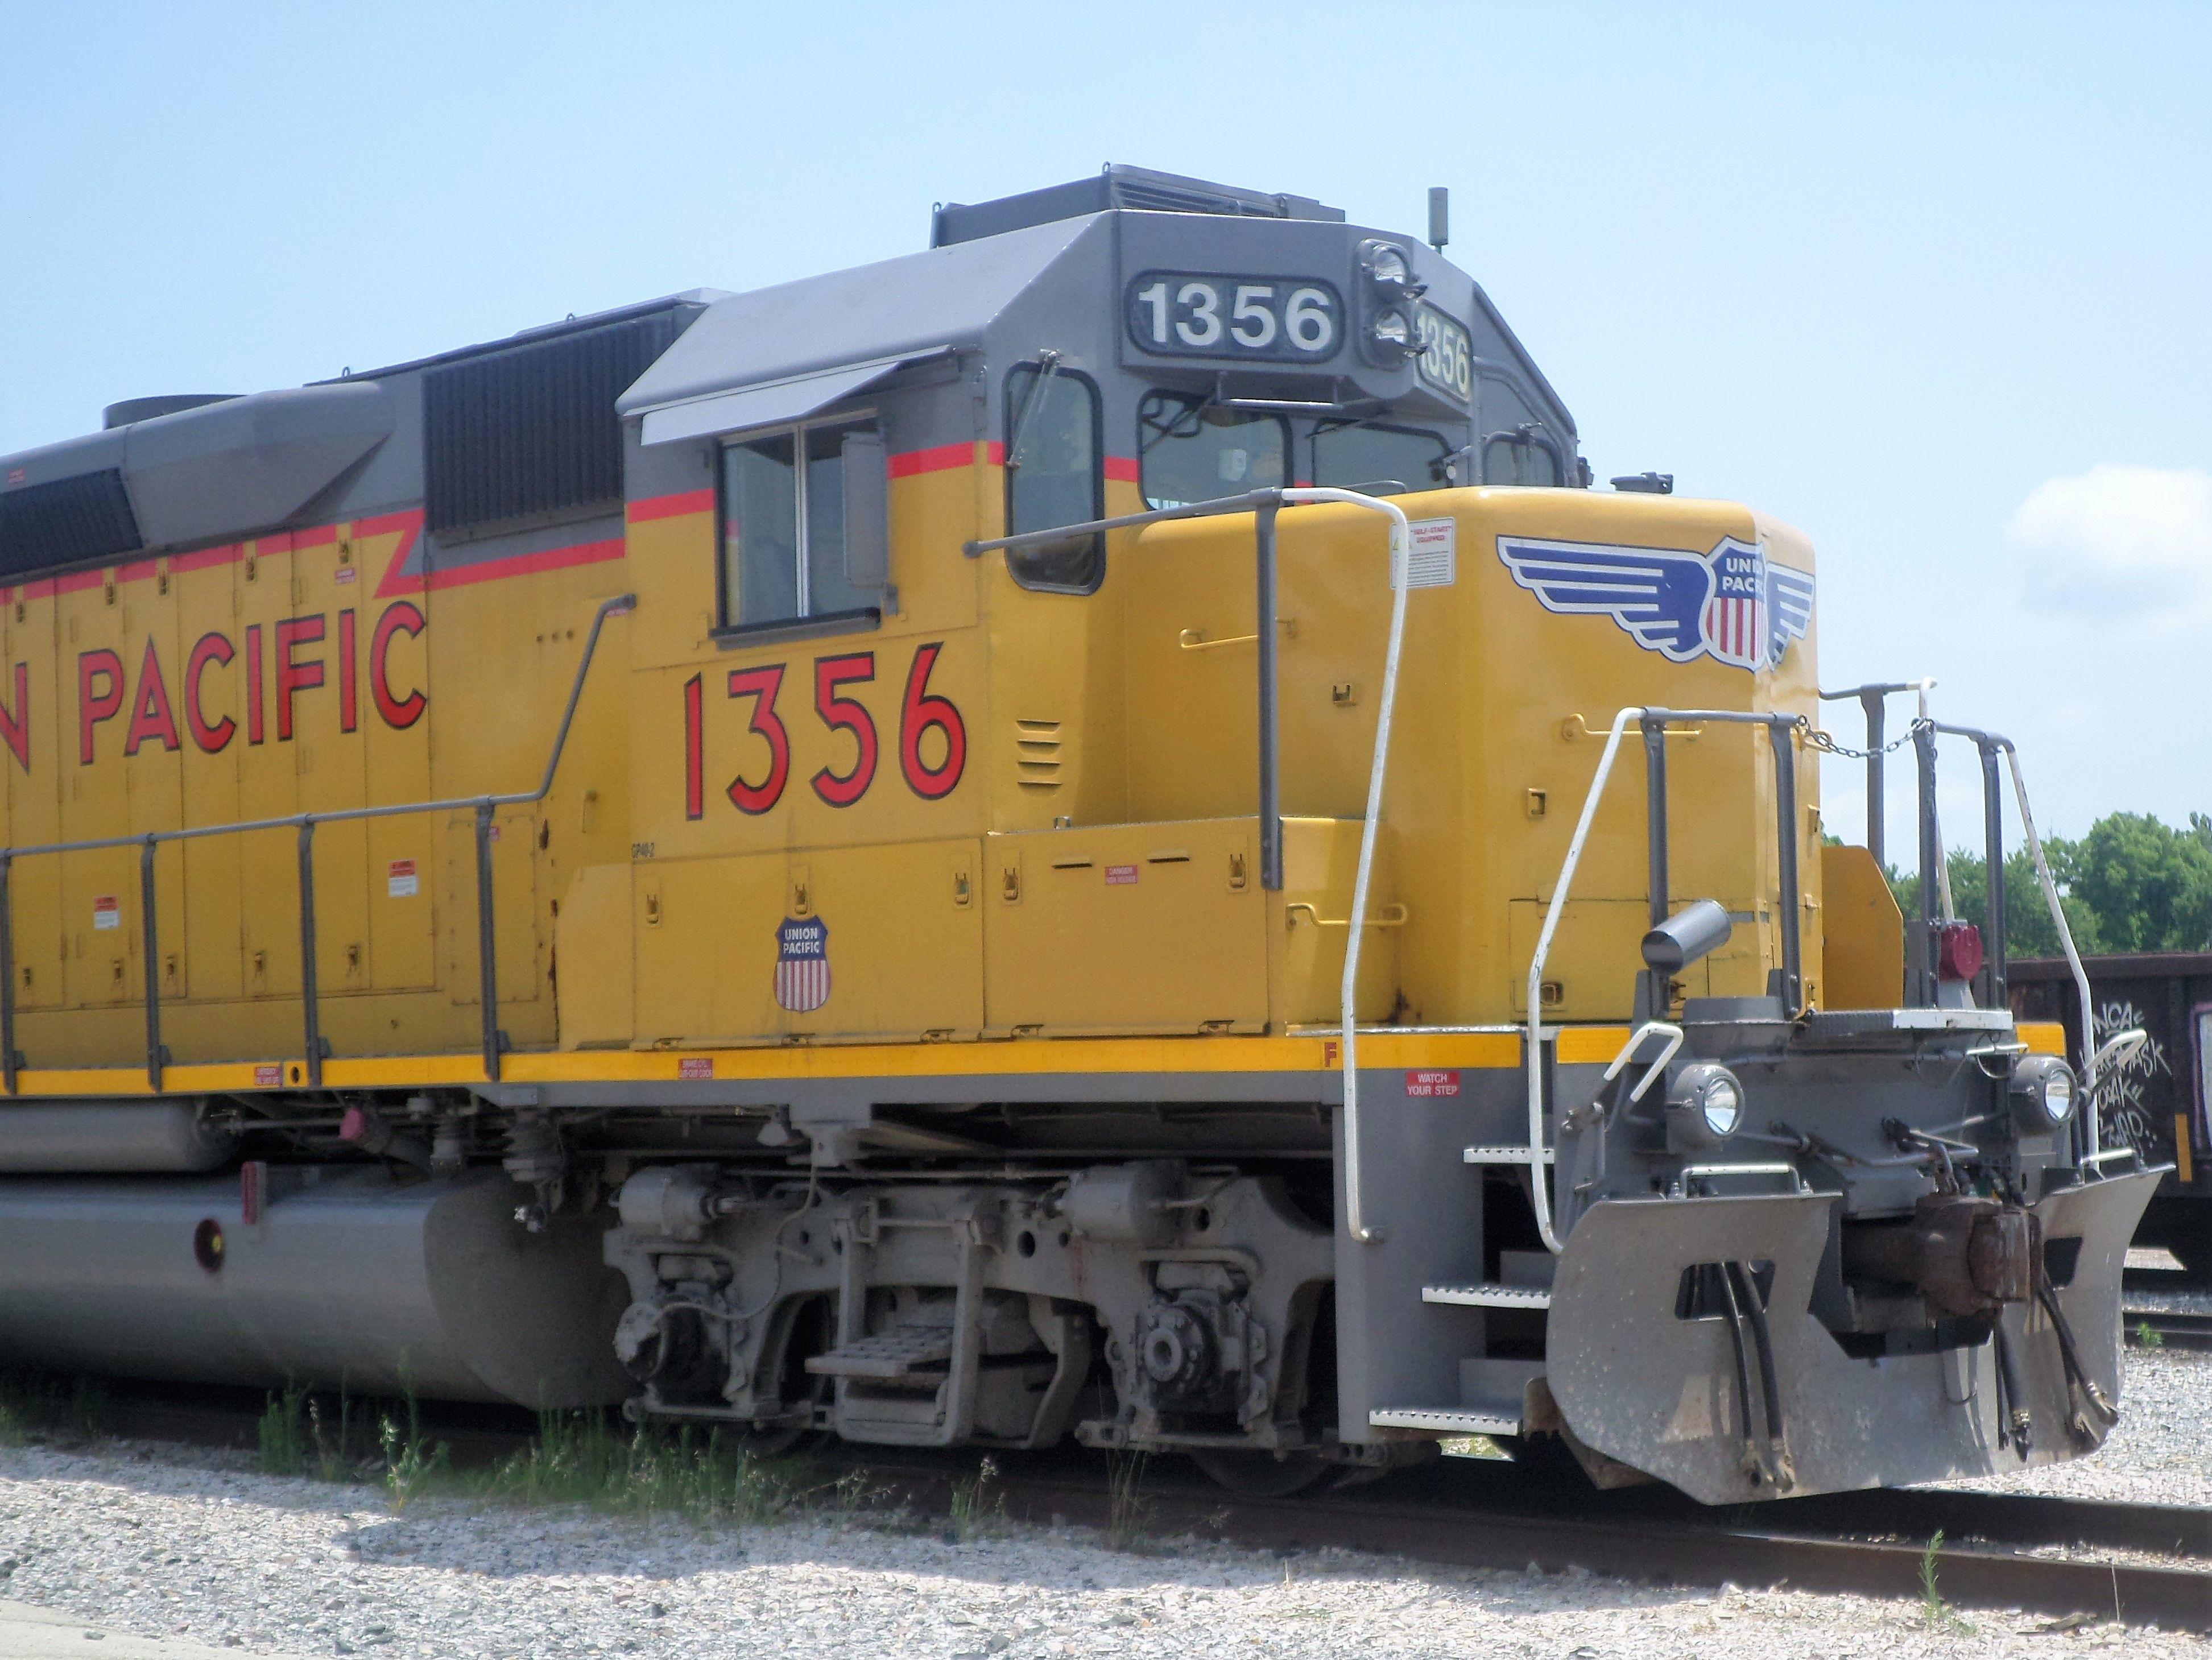 Smithville Railway Sidings, May 2016 Interesting